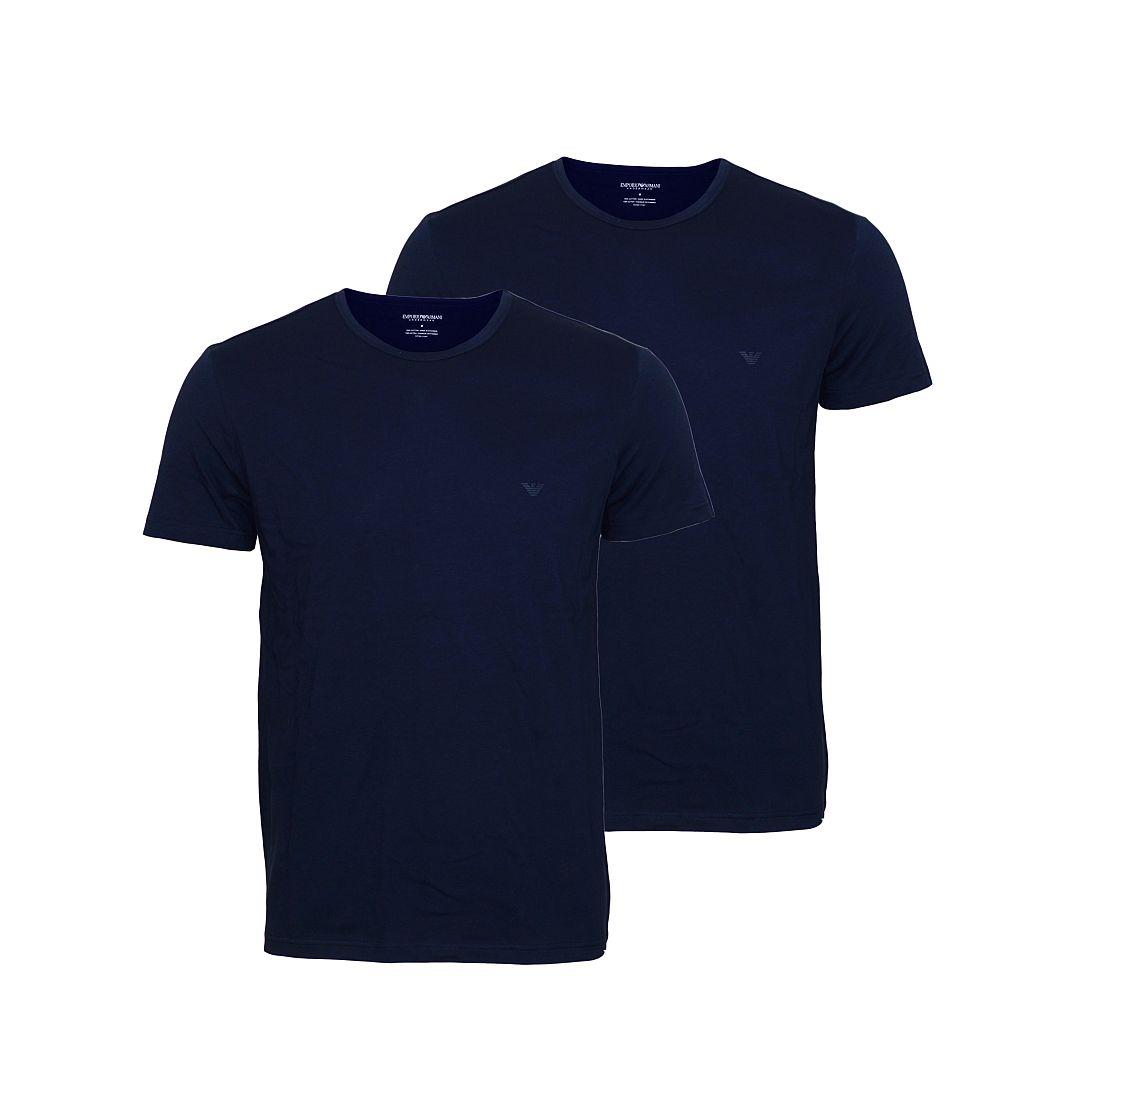 EMPORIO ARMANI 2er Pack Shirt T-Shirt navy 111647 CC722 27435